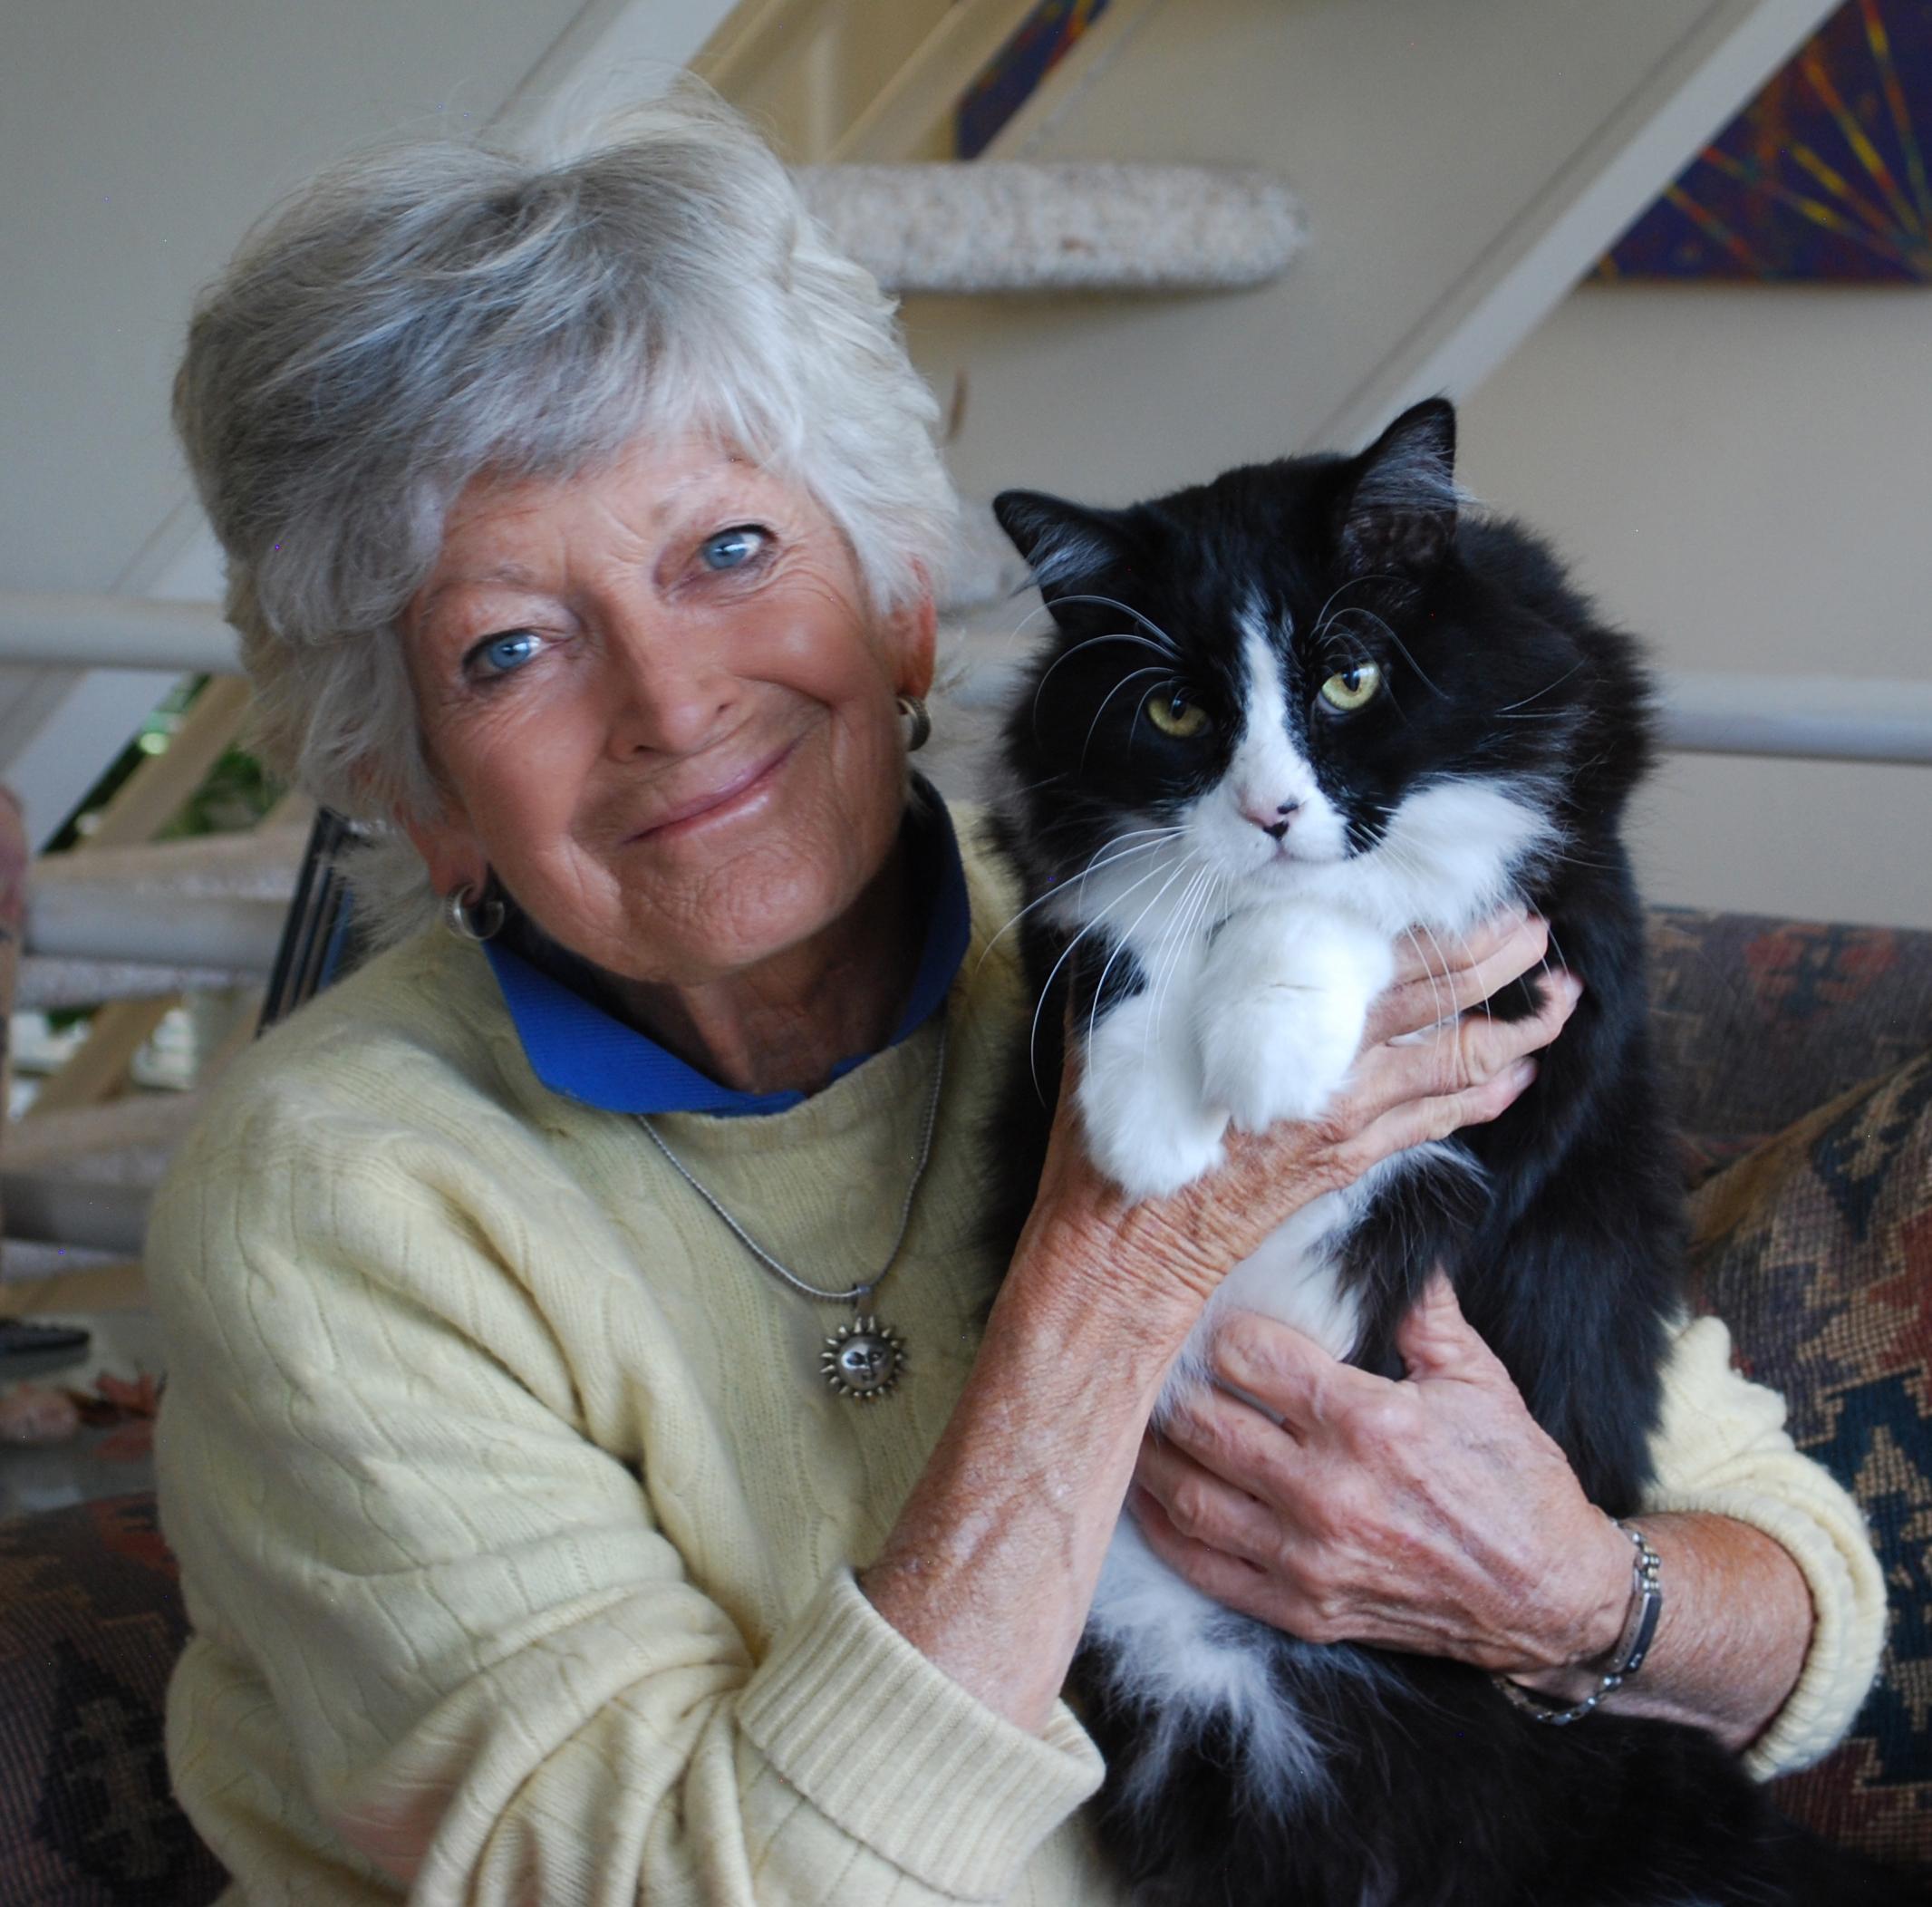 Mimi Teschner & Pascal